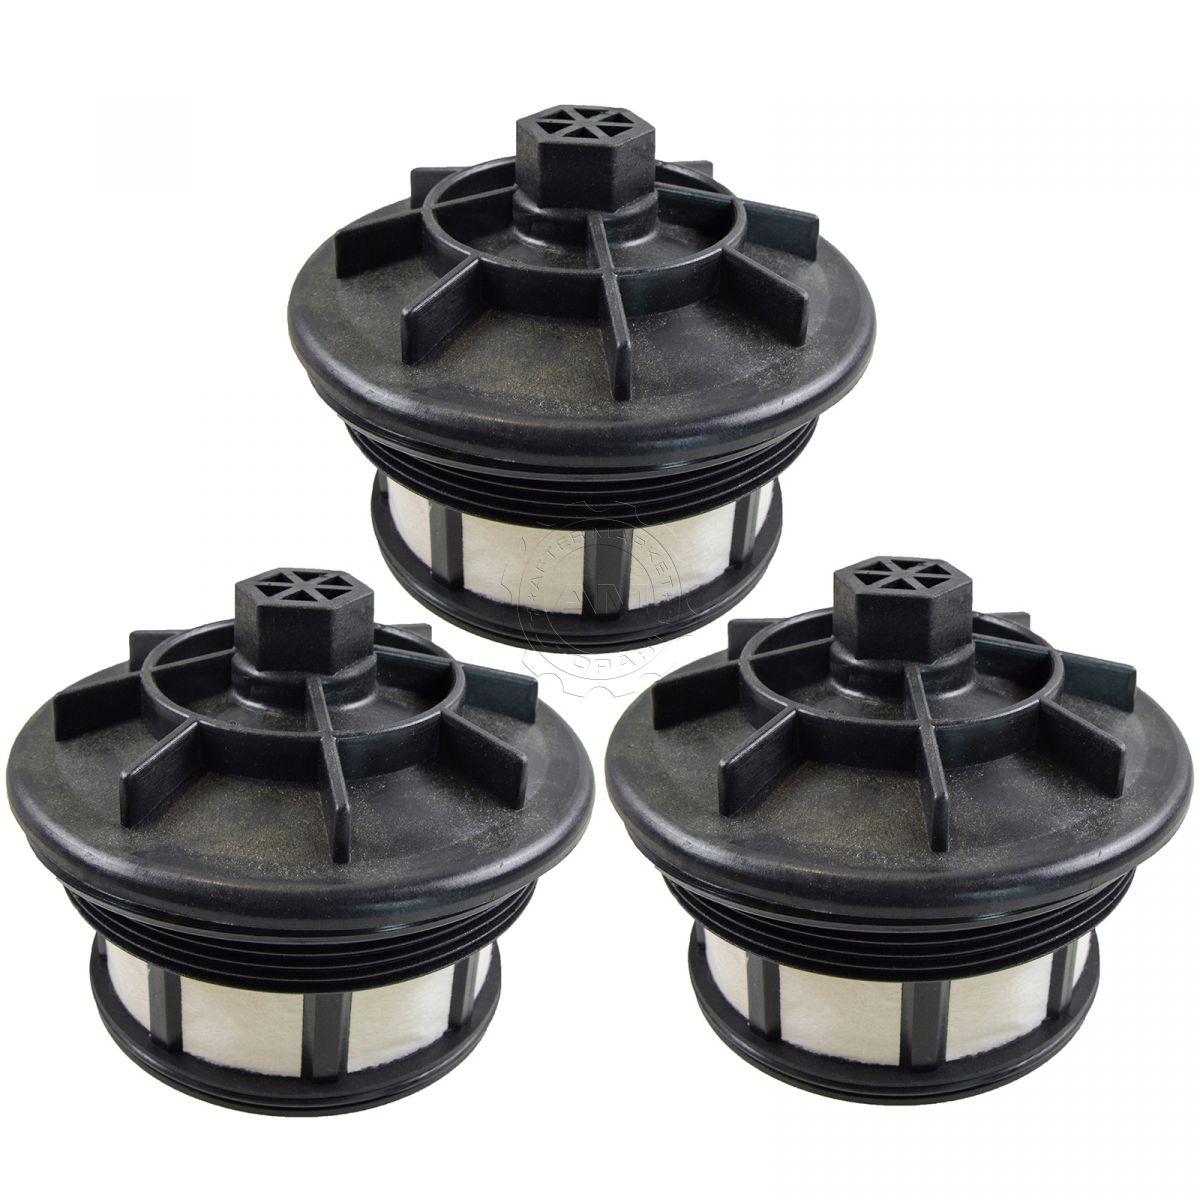 fuel filter set of 3 for ford f250 f350 super duty van 7 3l v8 turbo